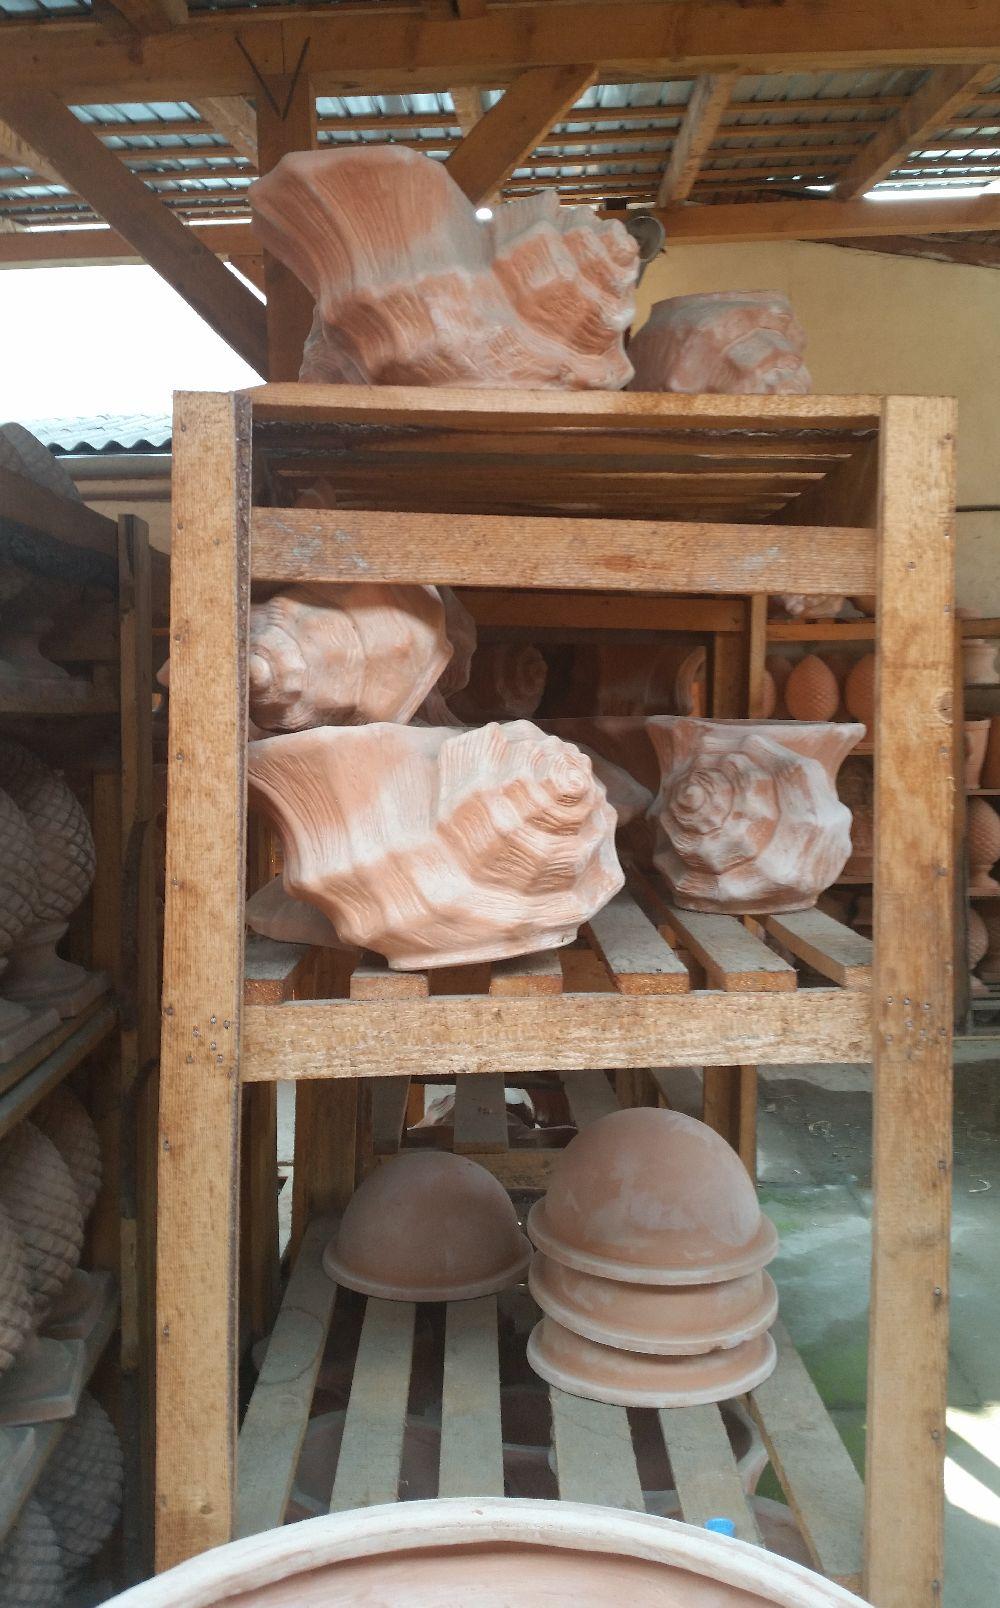 adelaparvu.com despre vase de gradina, ghivece si ornamente din teracota, lut, Terecote Sighisoara Romania (17)